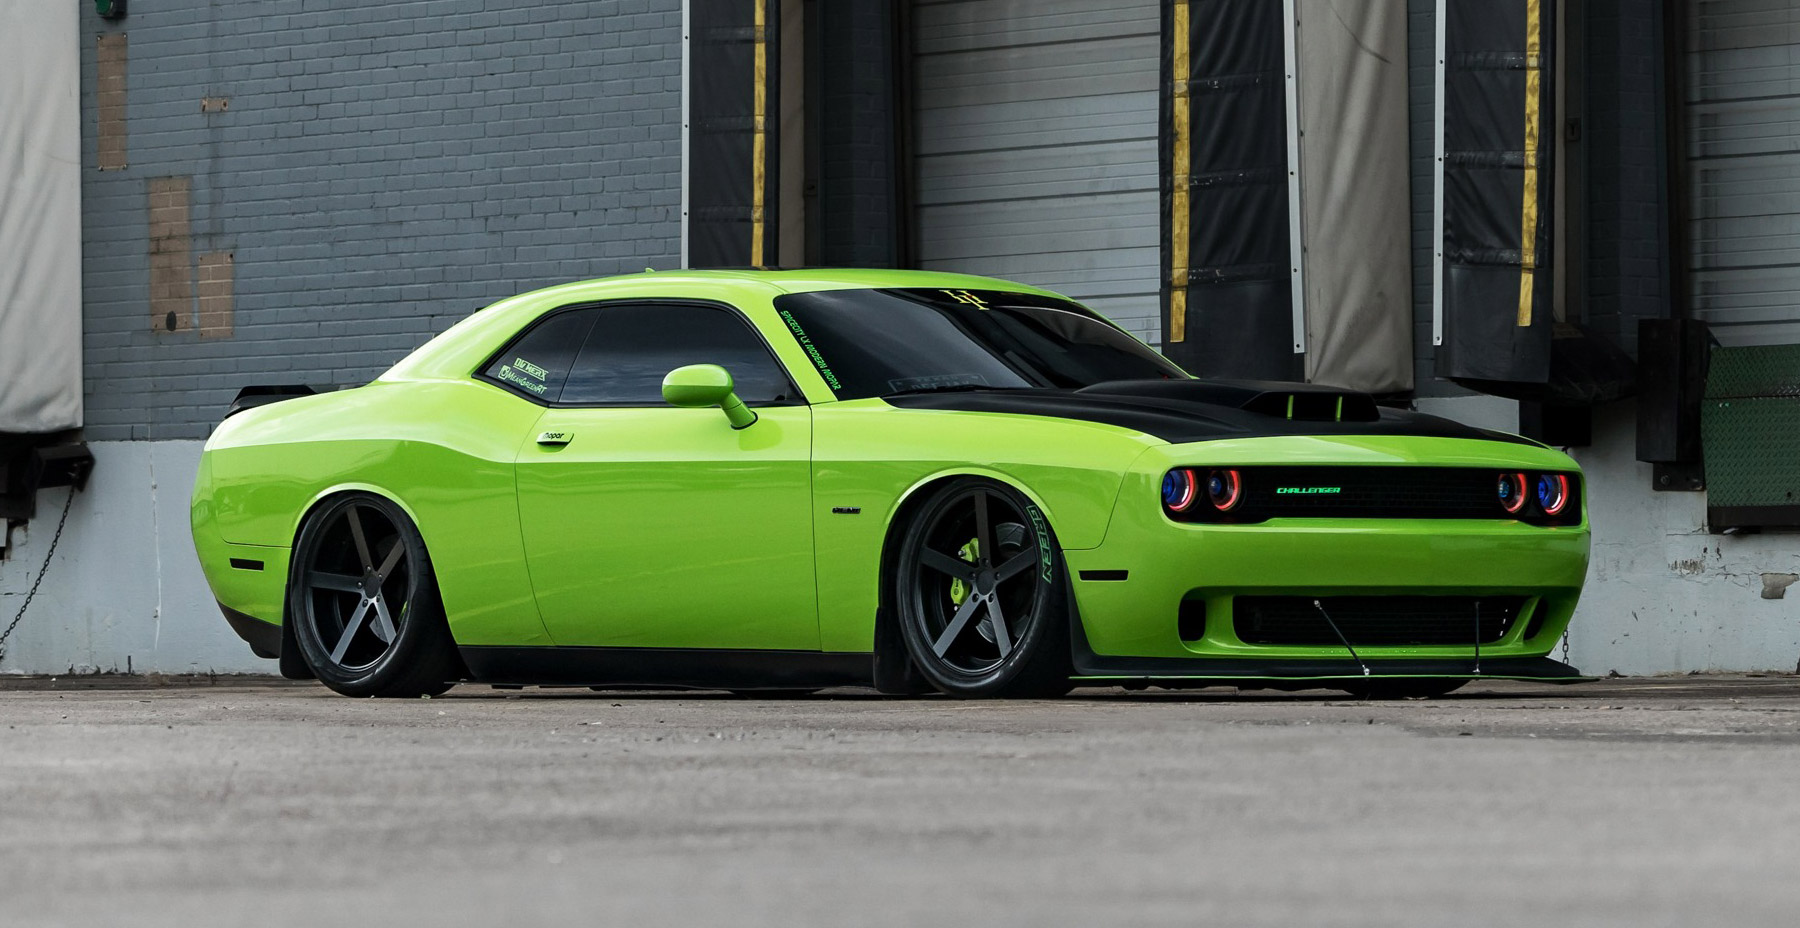 Green Dodge Challenger x Rohana RC22 Wheels (Finished in Matte Black Wheel)